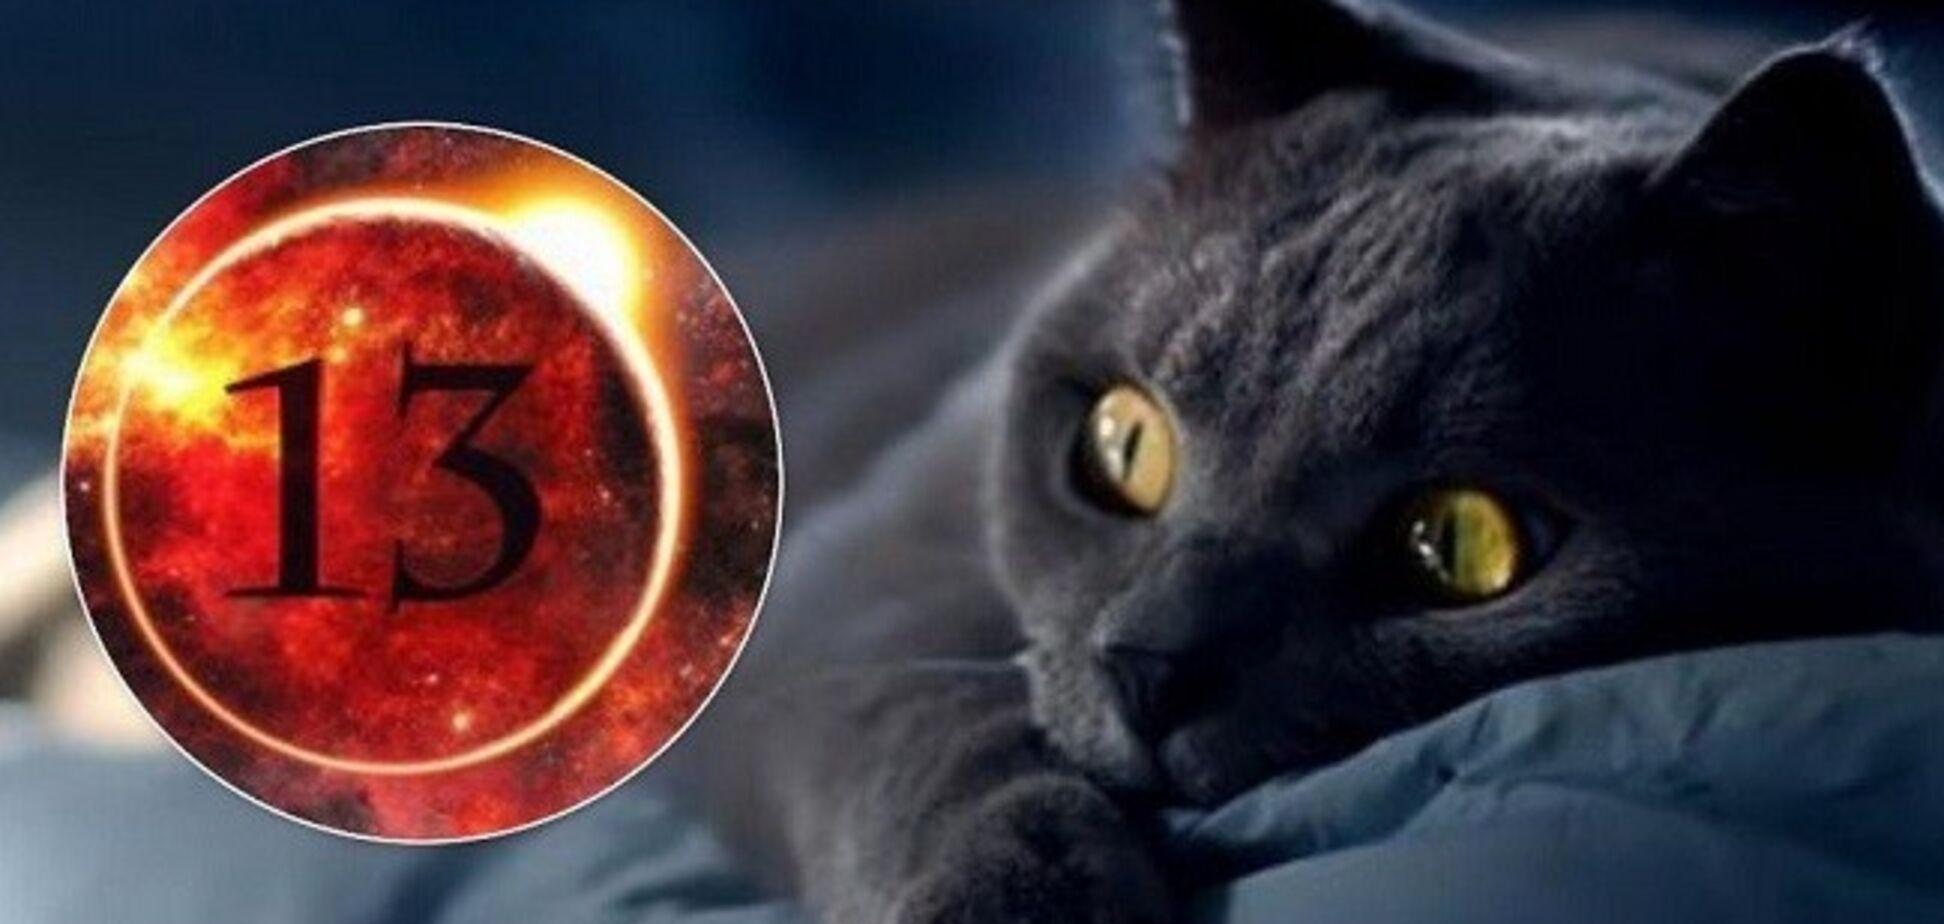 Пятница 13-е: на какие знаки Зодиака повлияет сильнее всего